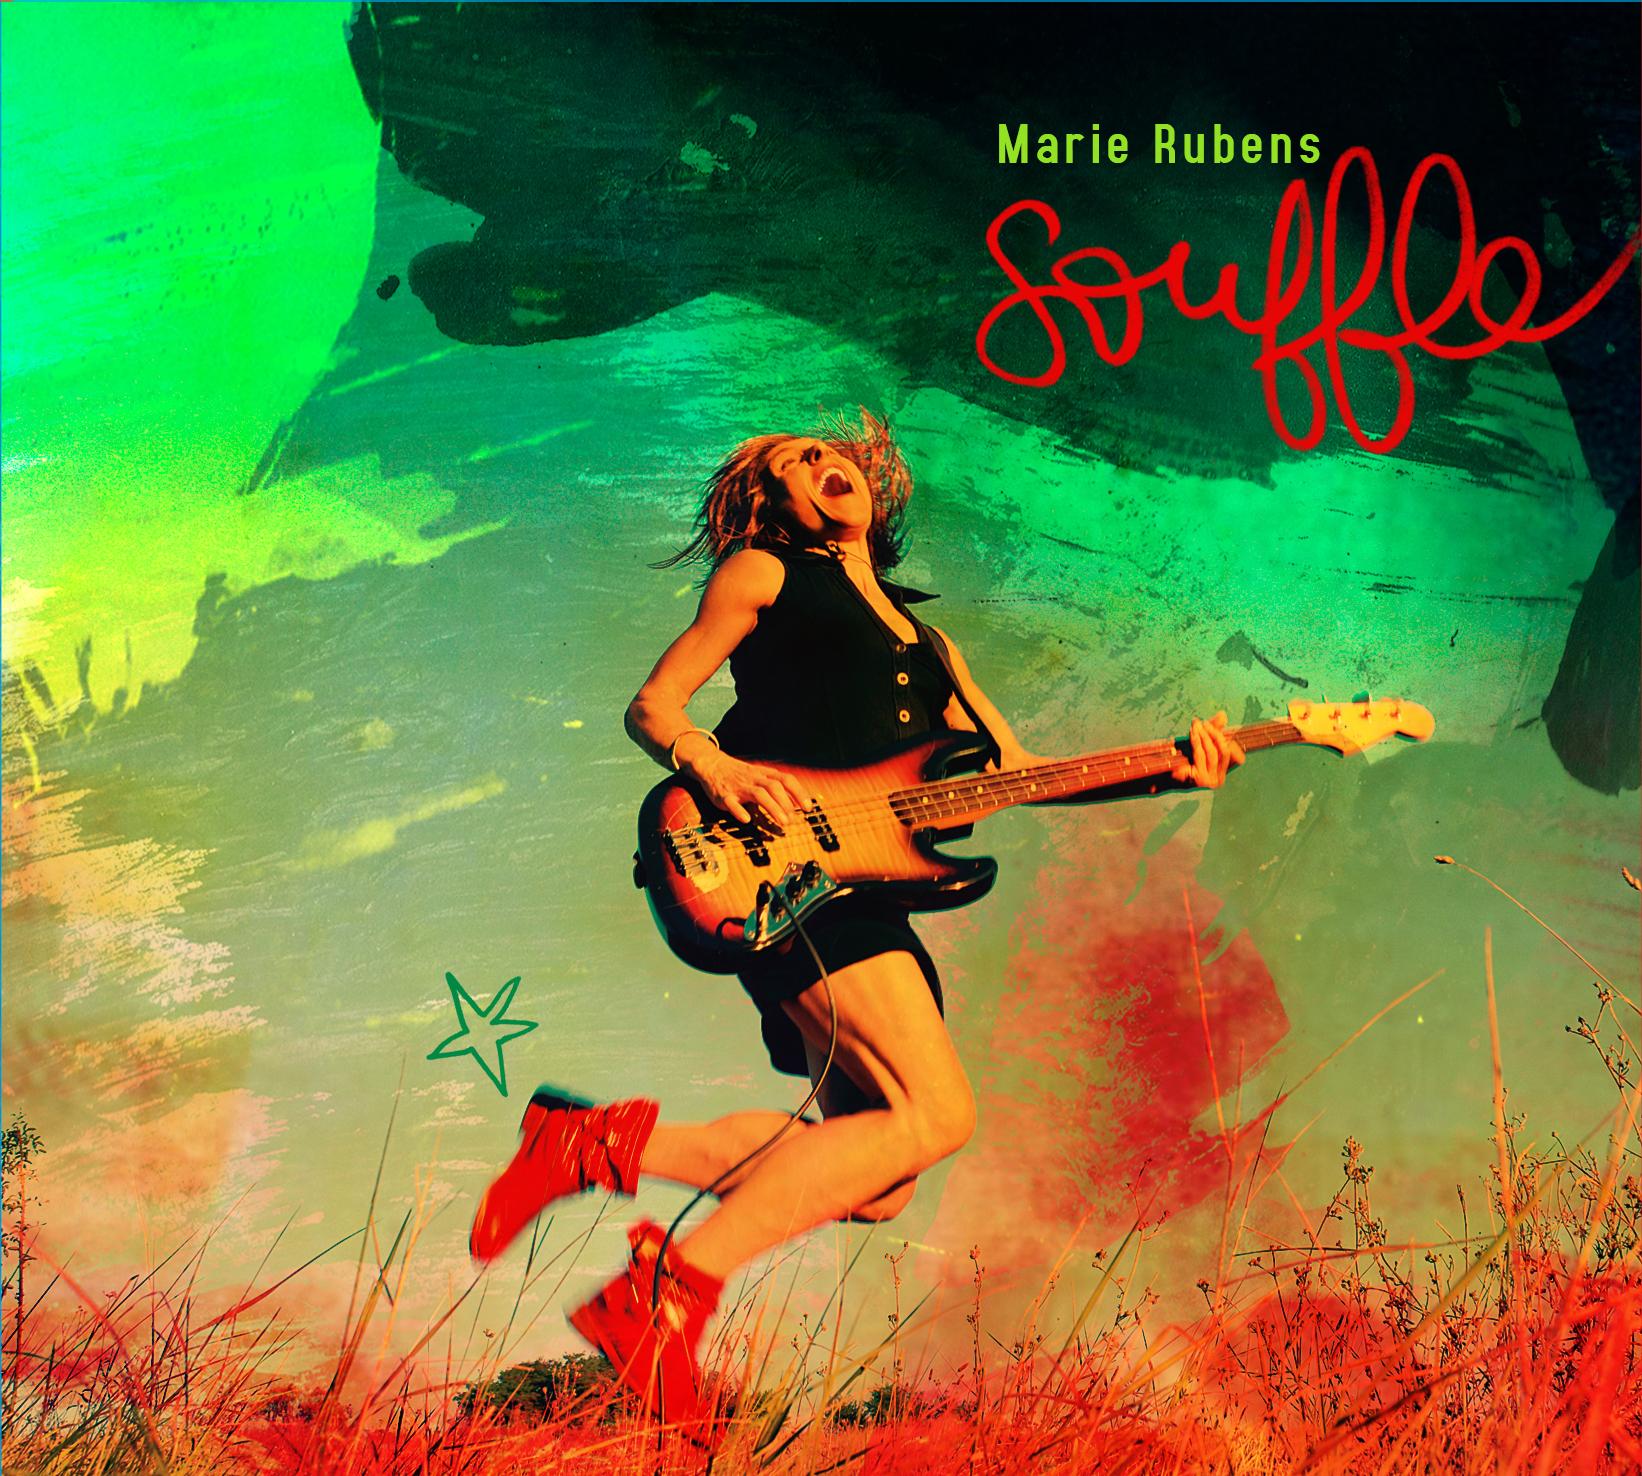 01-MarieRubens_SOUFFLE-cover-1478211659.jpg